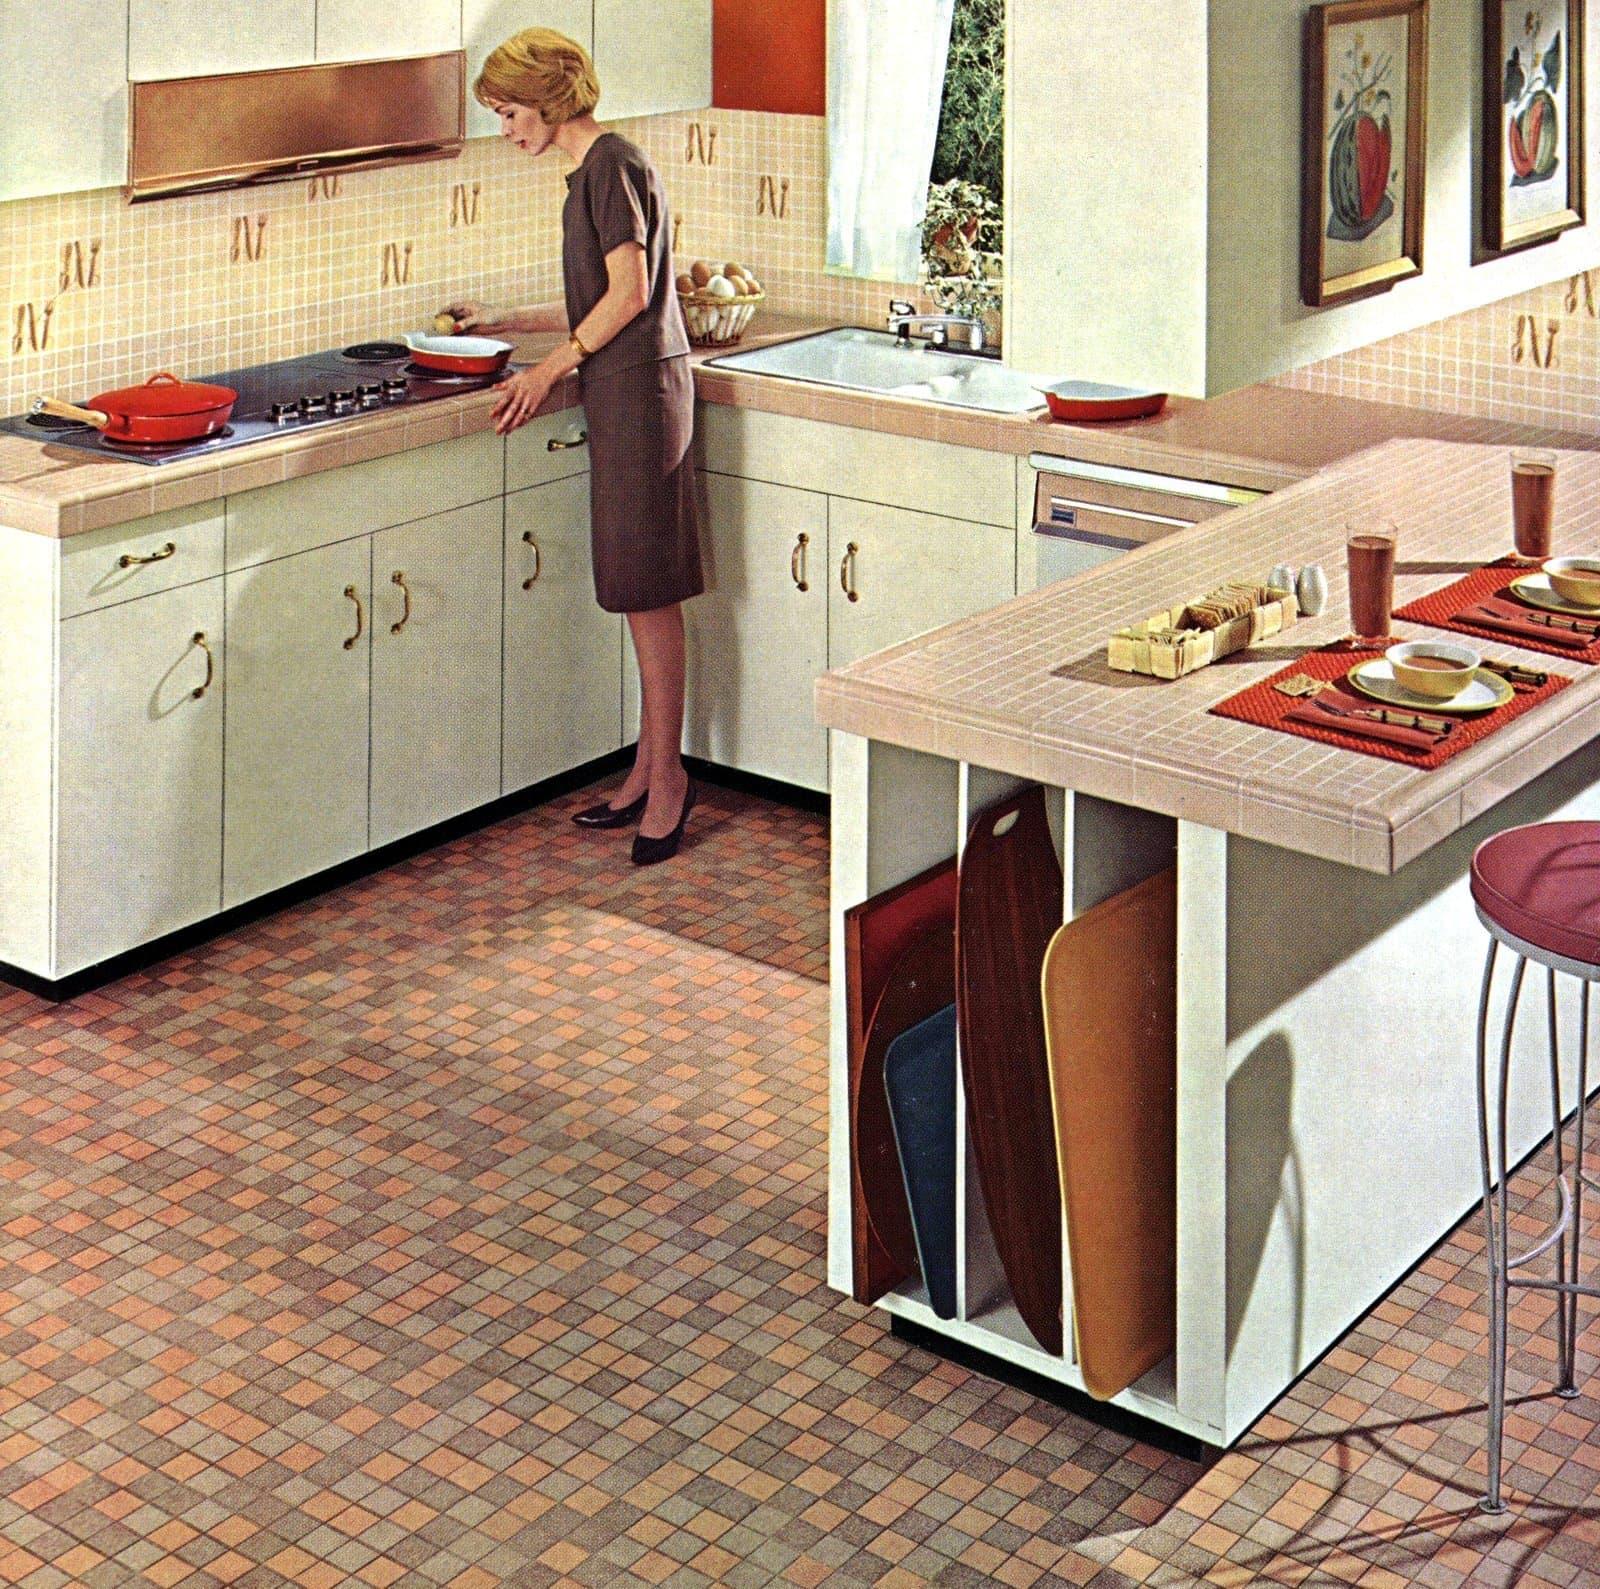 1960s home decor - Kitchen tile countertops floor and backsplashes